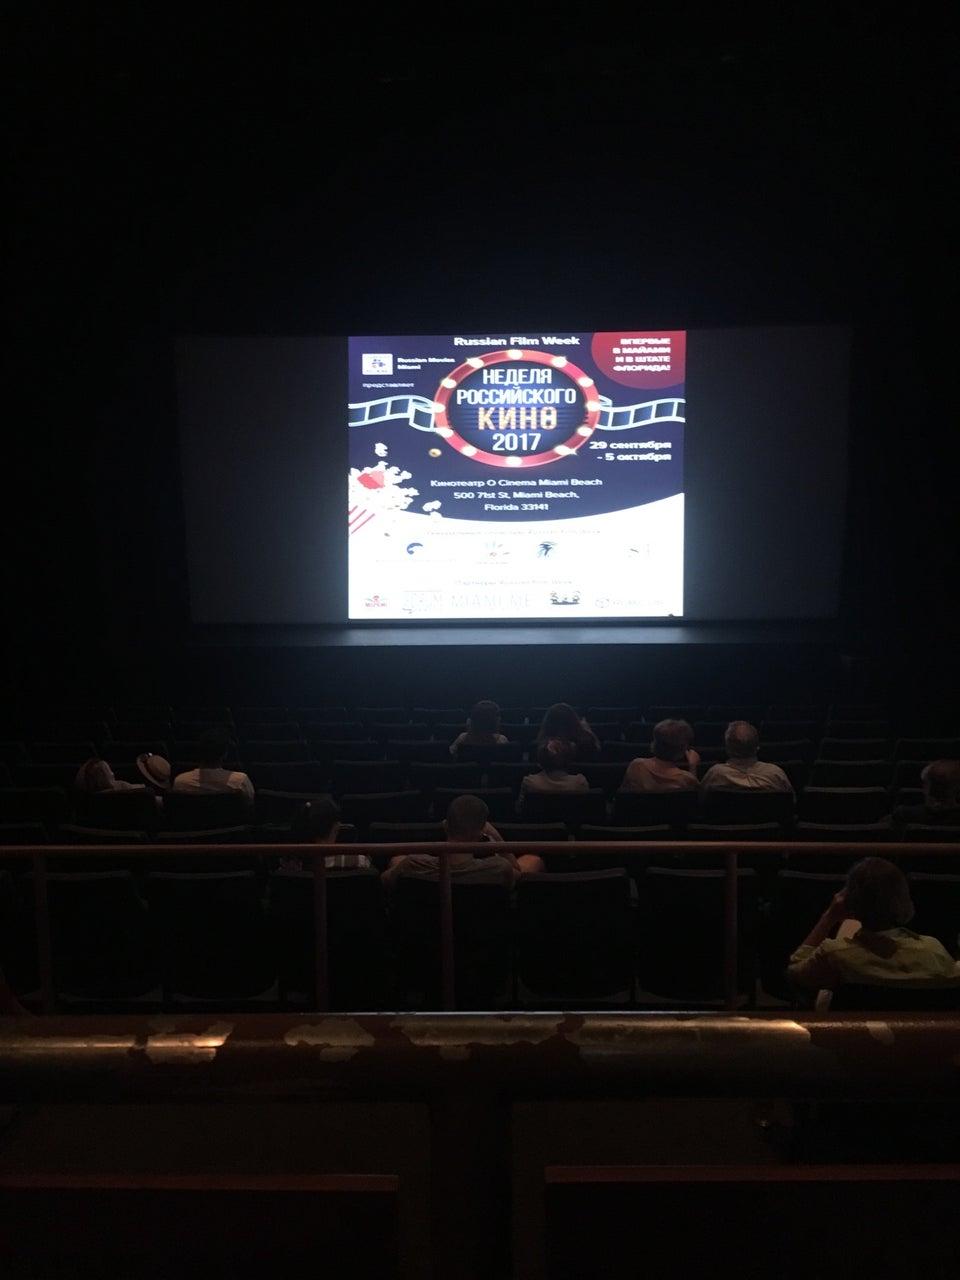 Photo of O Cinema Miami Beach